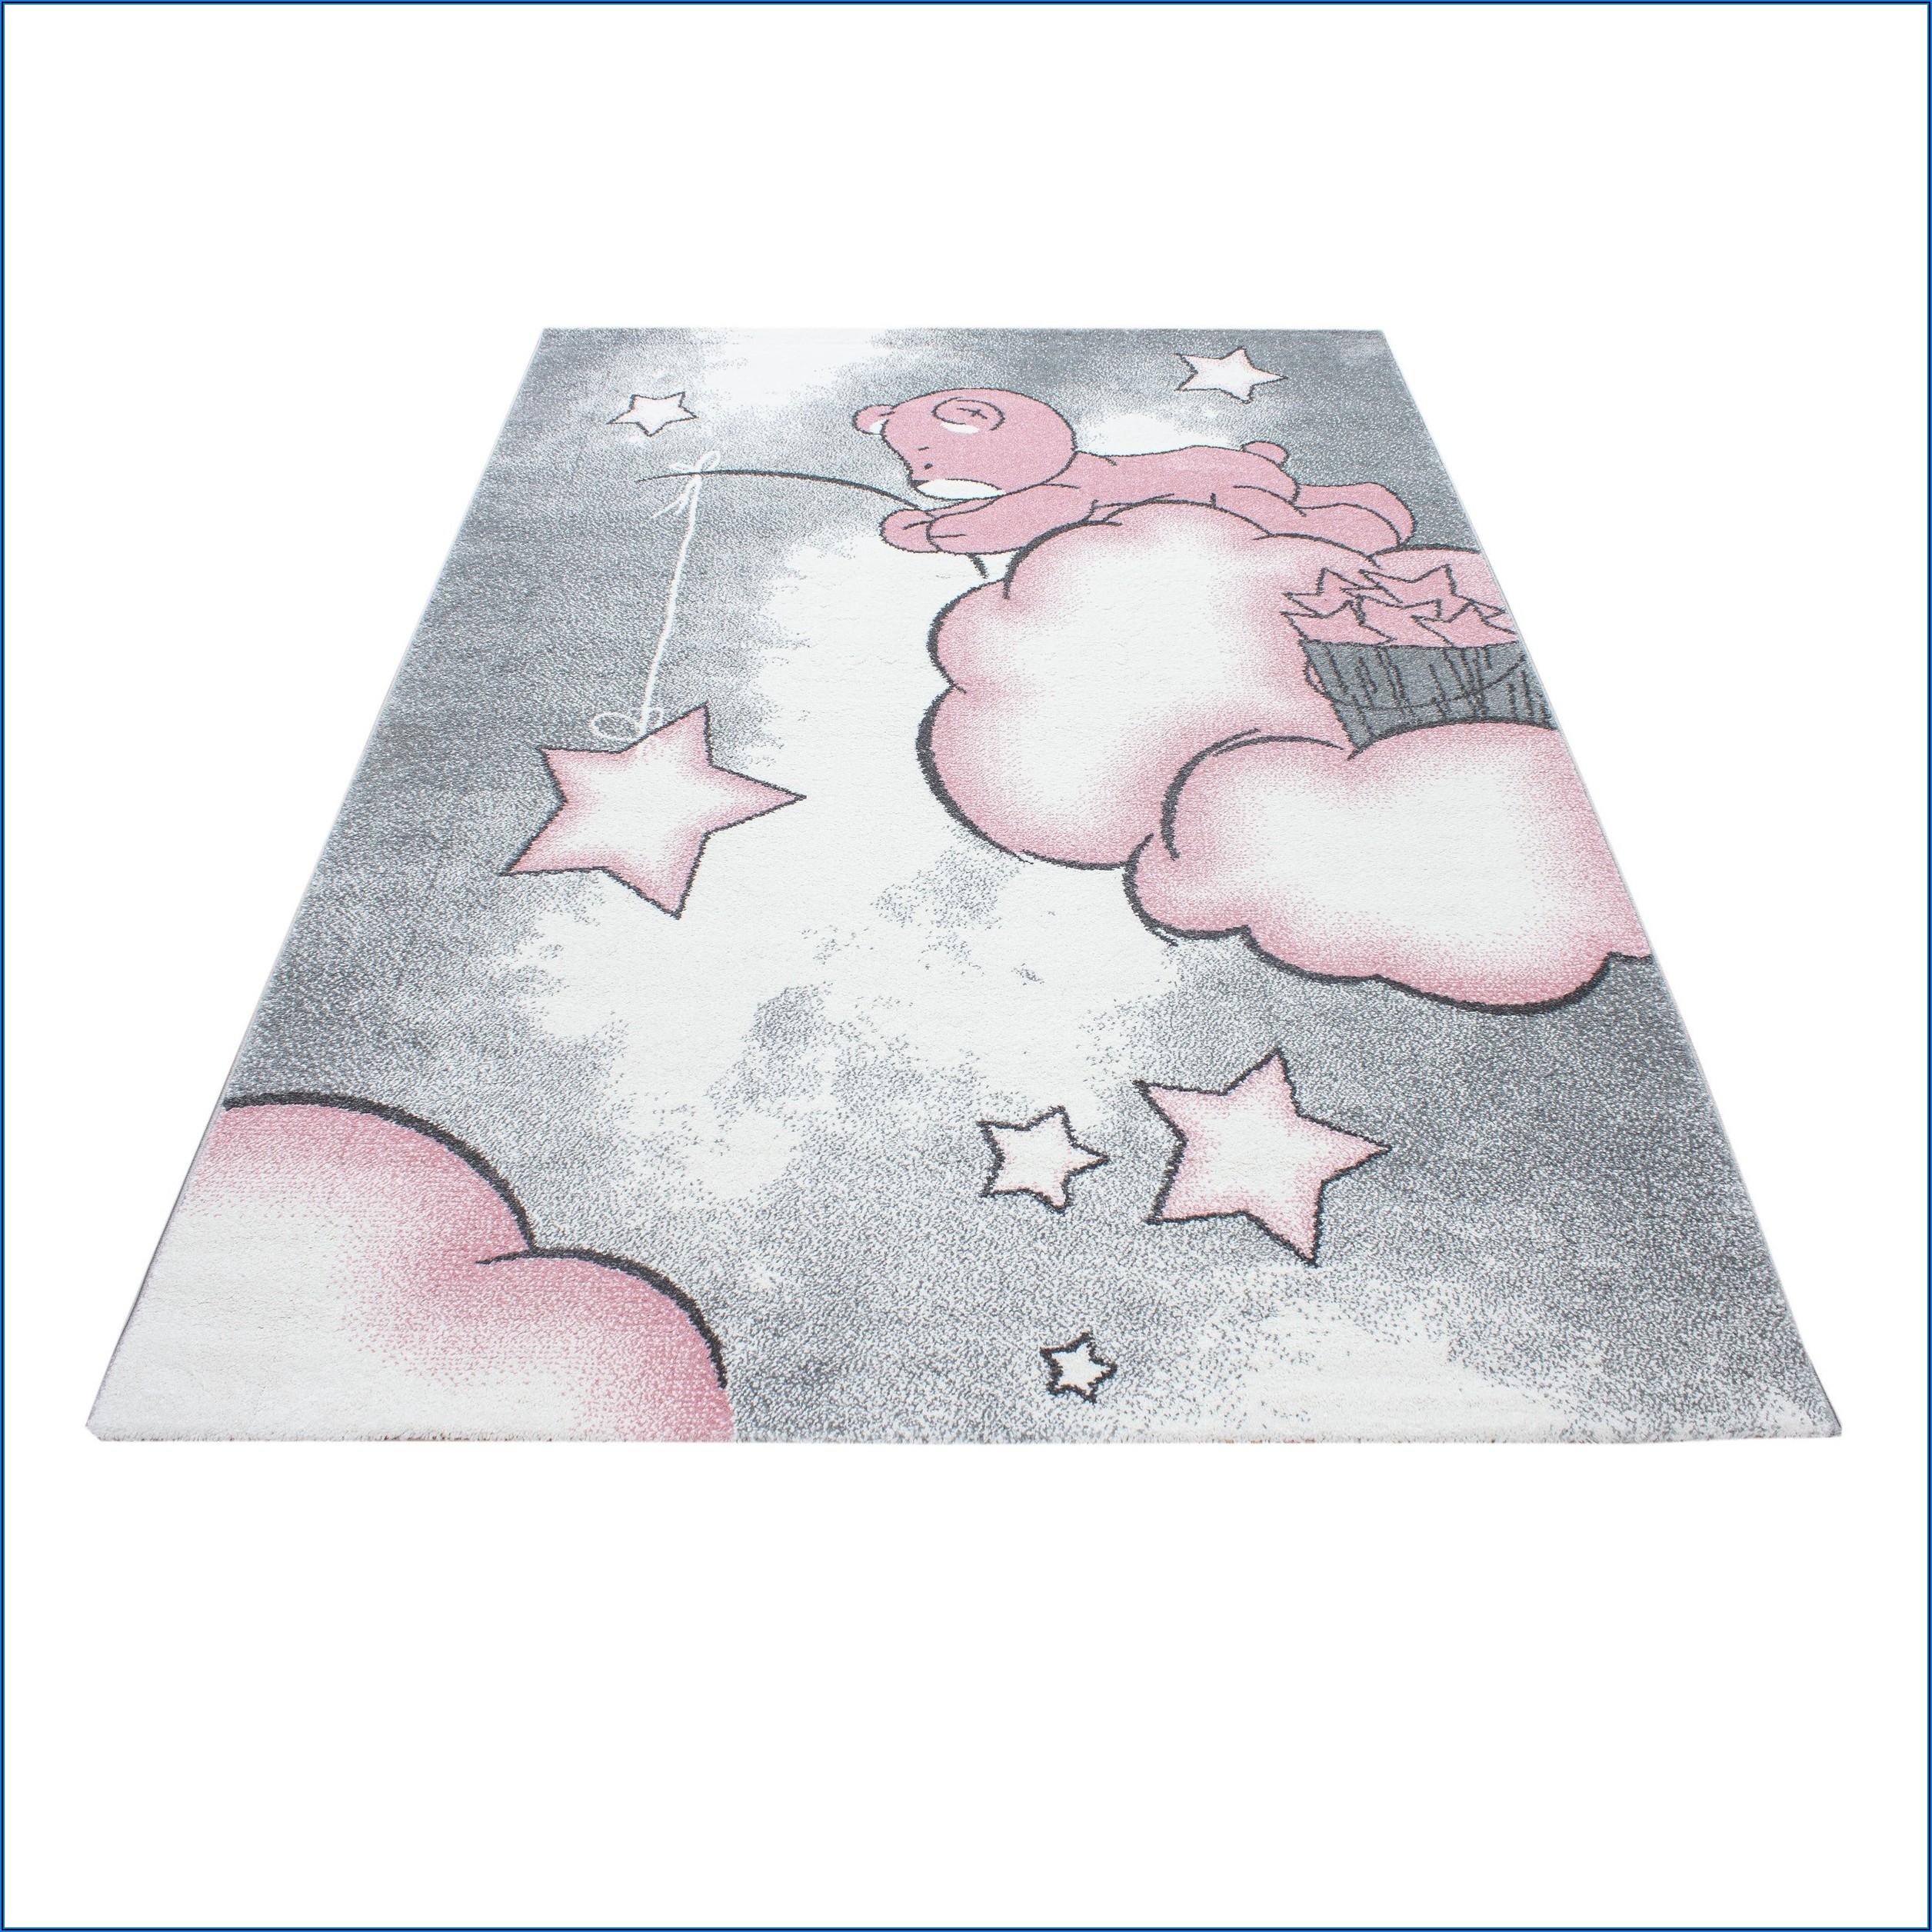 Kinderzimmer Teppich Bär